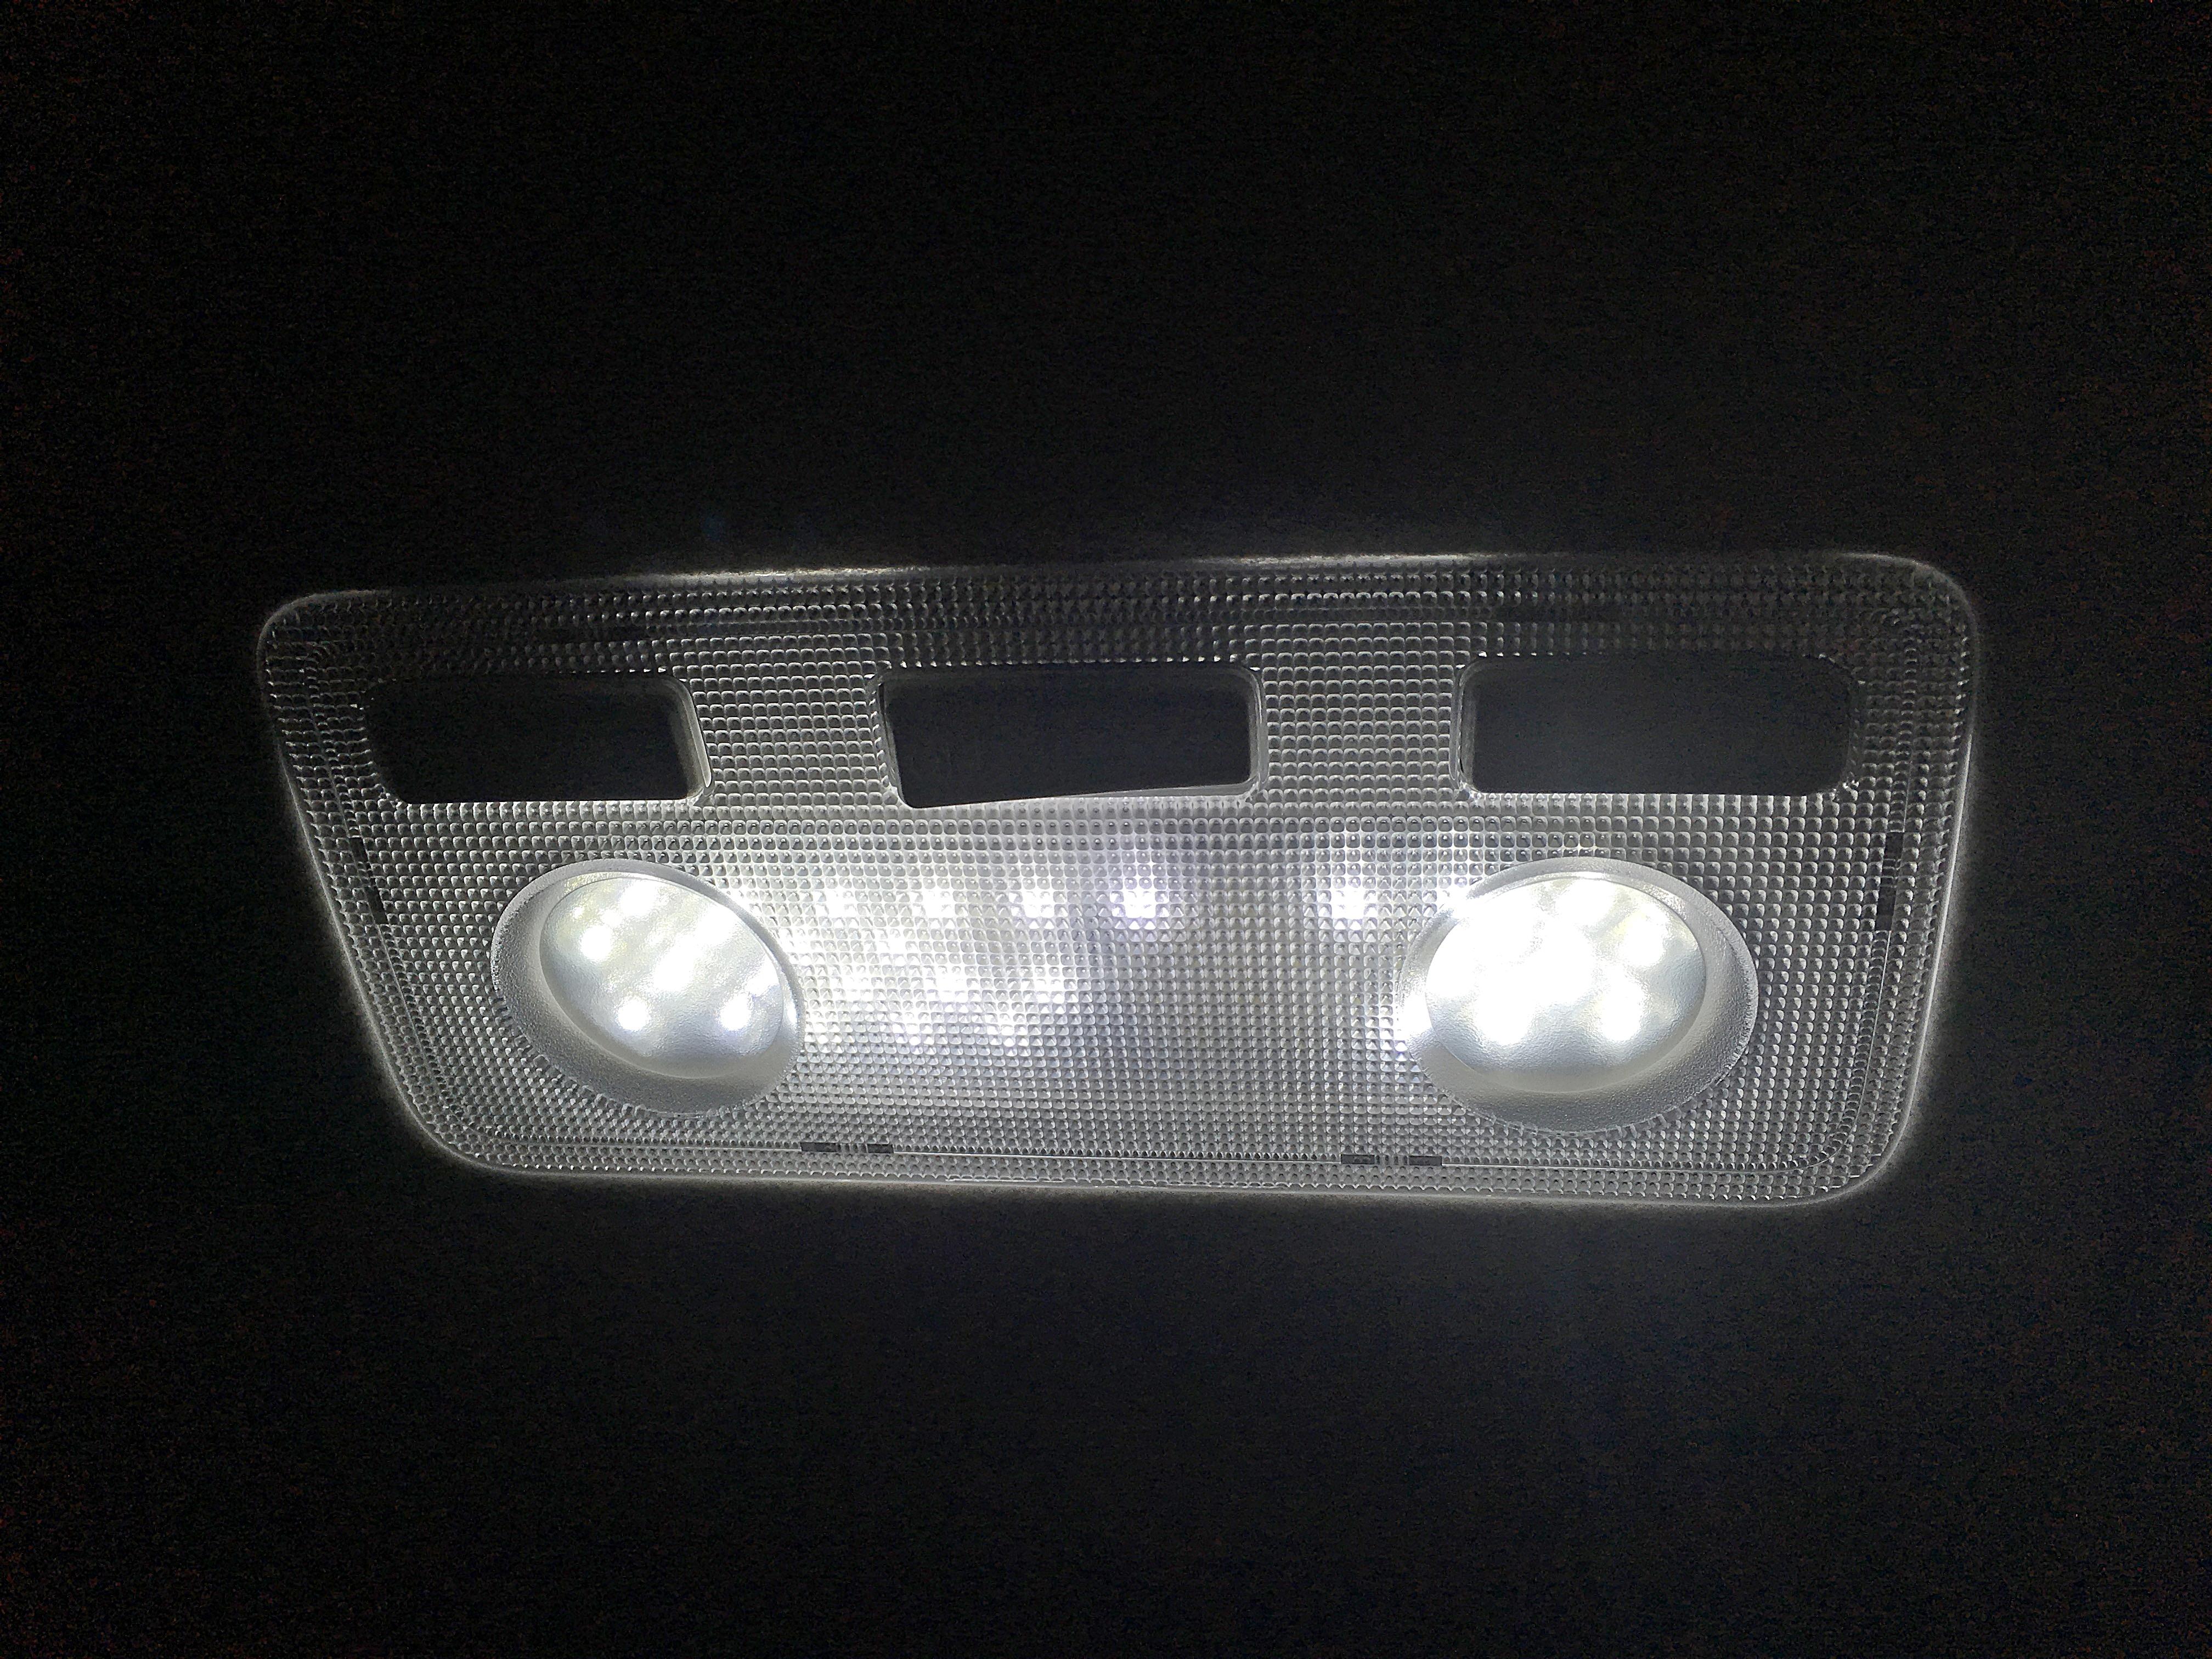 Prius C ルームランプ.JPG